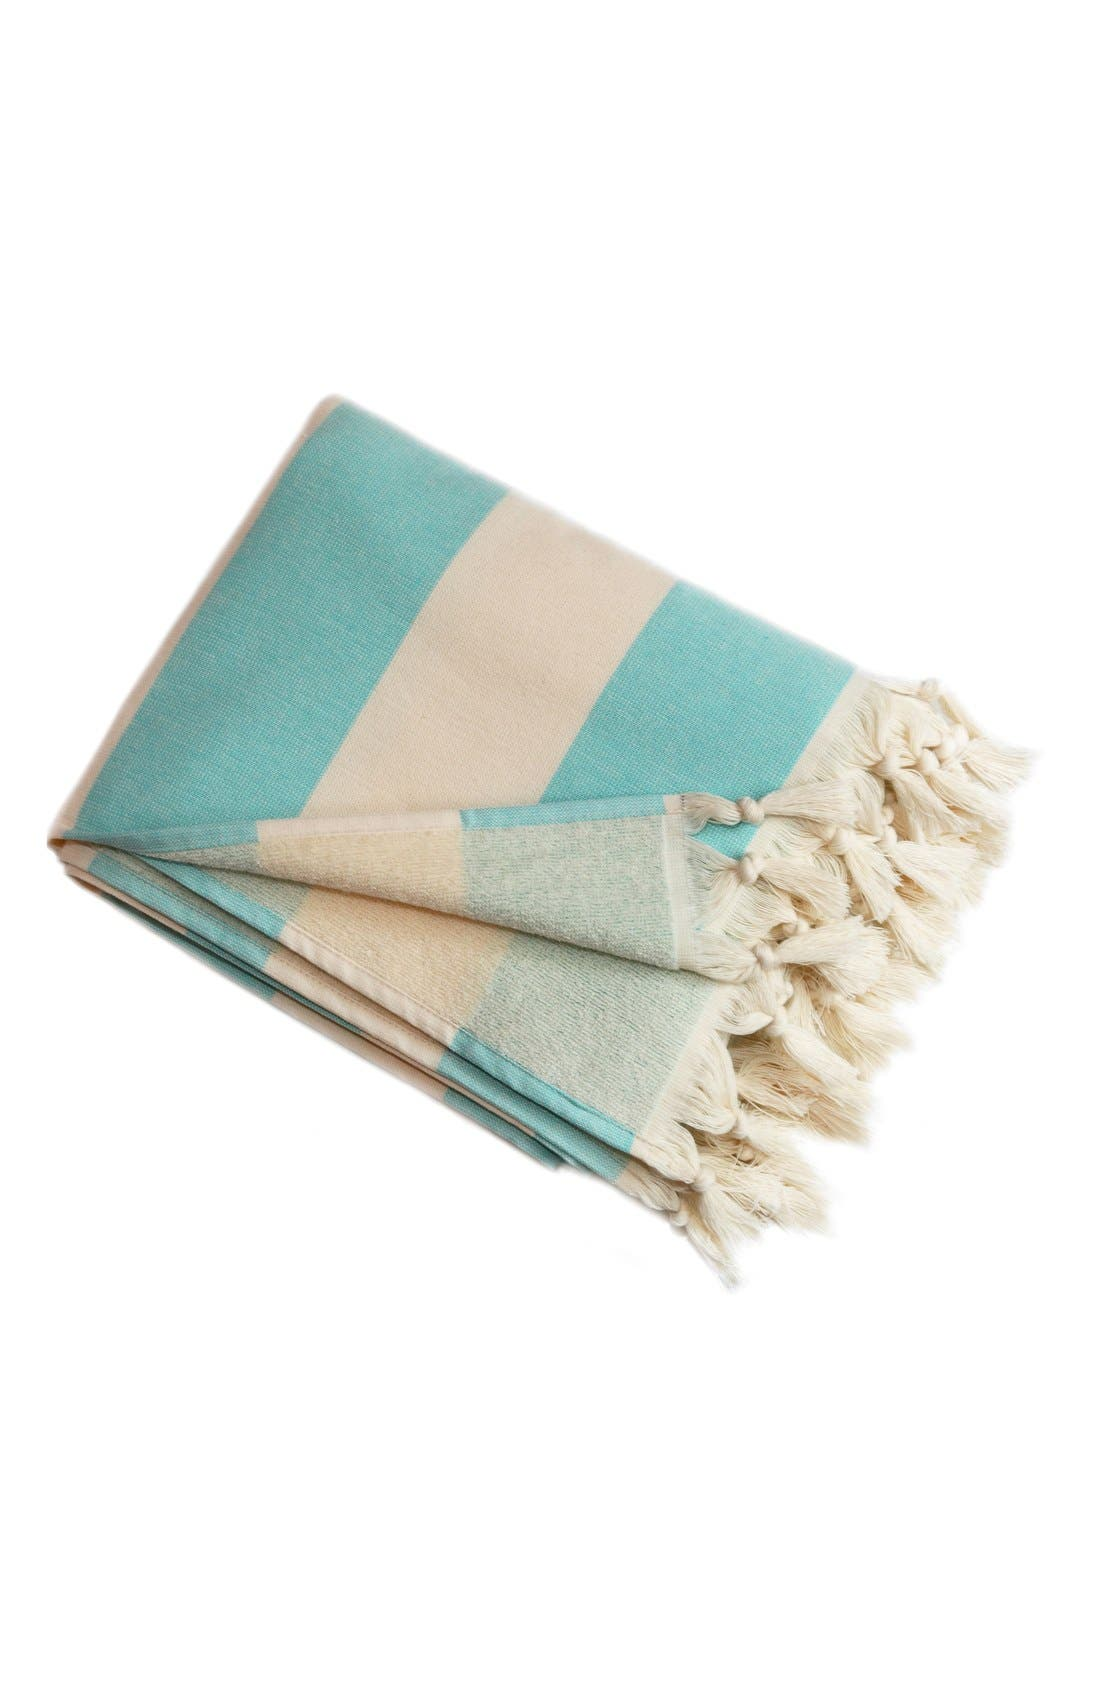 'Patara' Turkish Pestemal Towel,                         Main,                         color, Turquiose